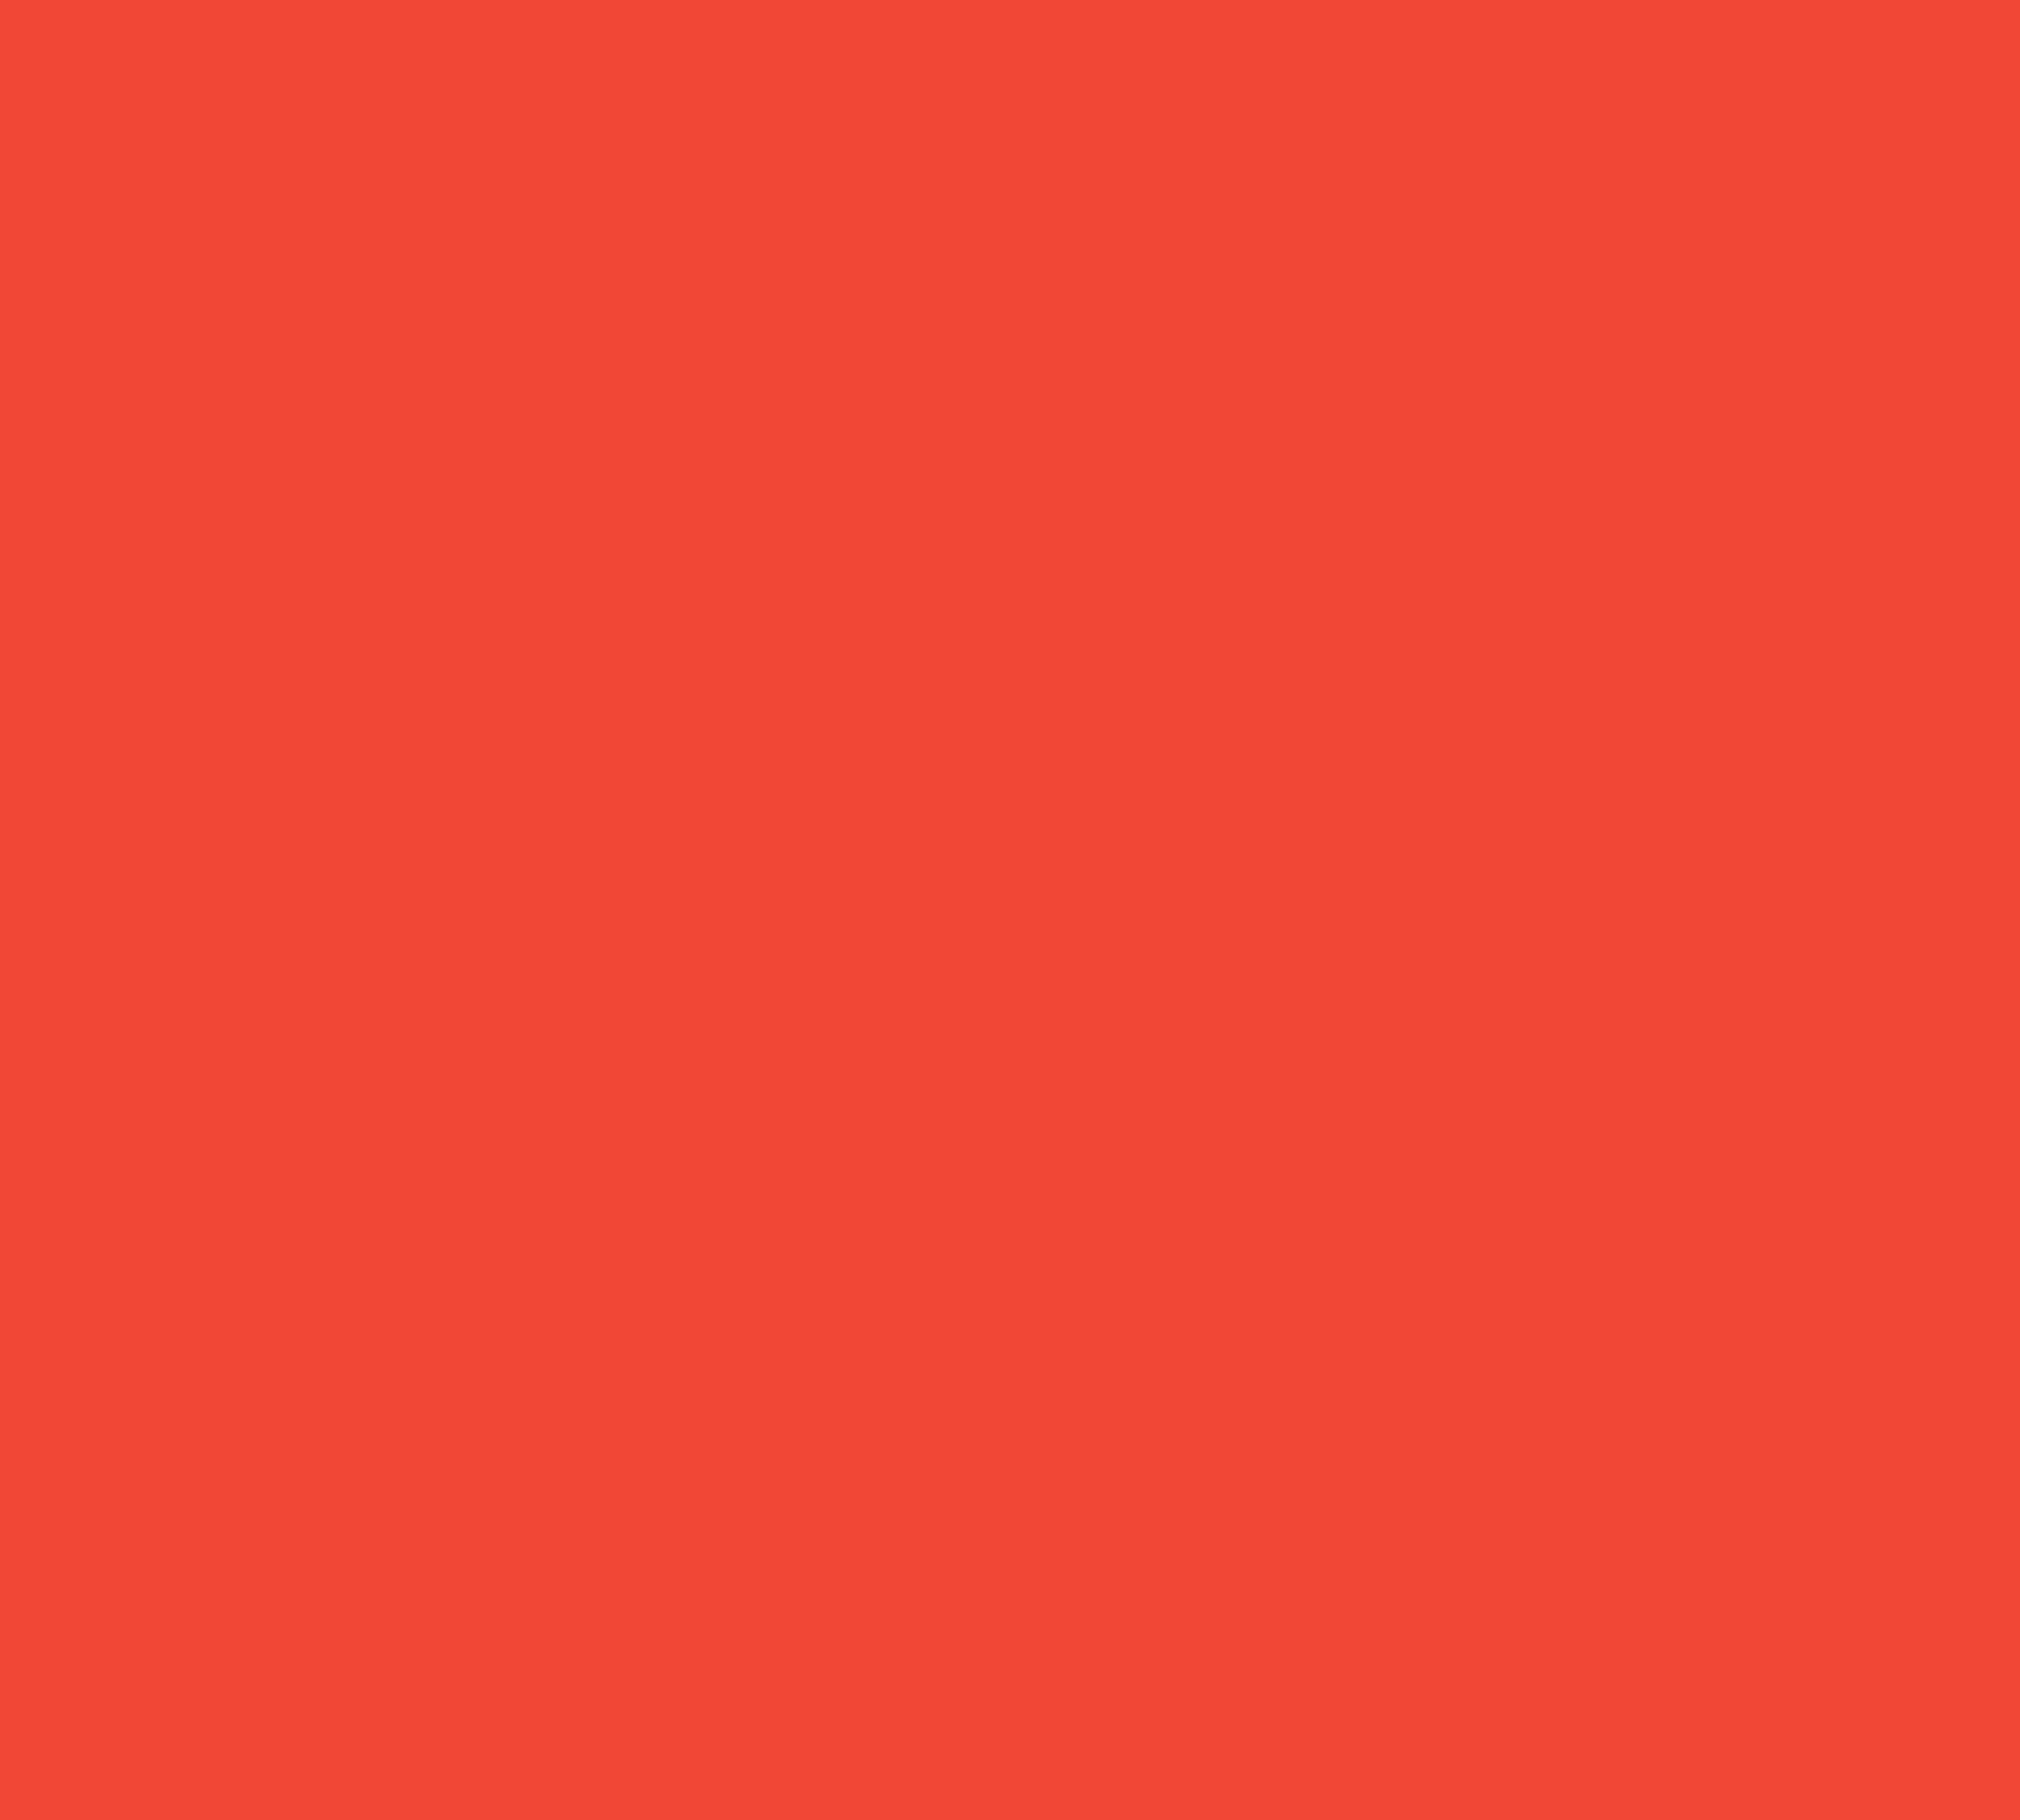 Sumi Shio Wagyu Beef Logo Red Outline